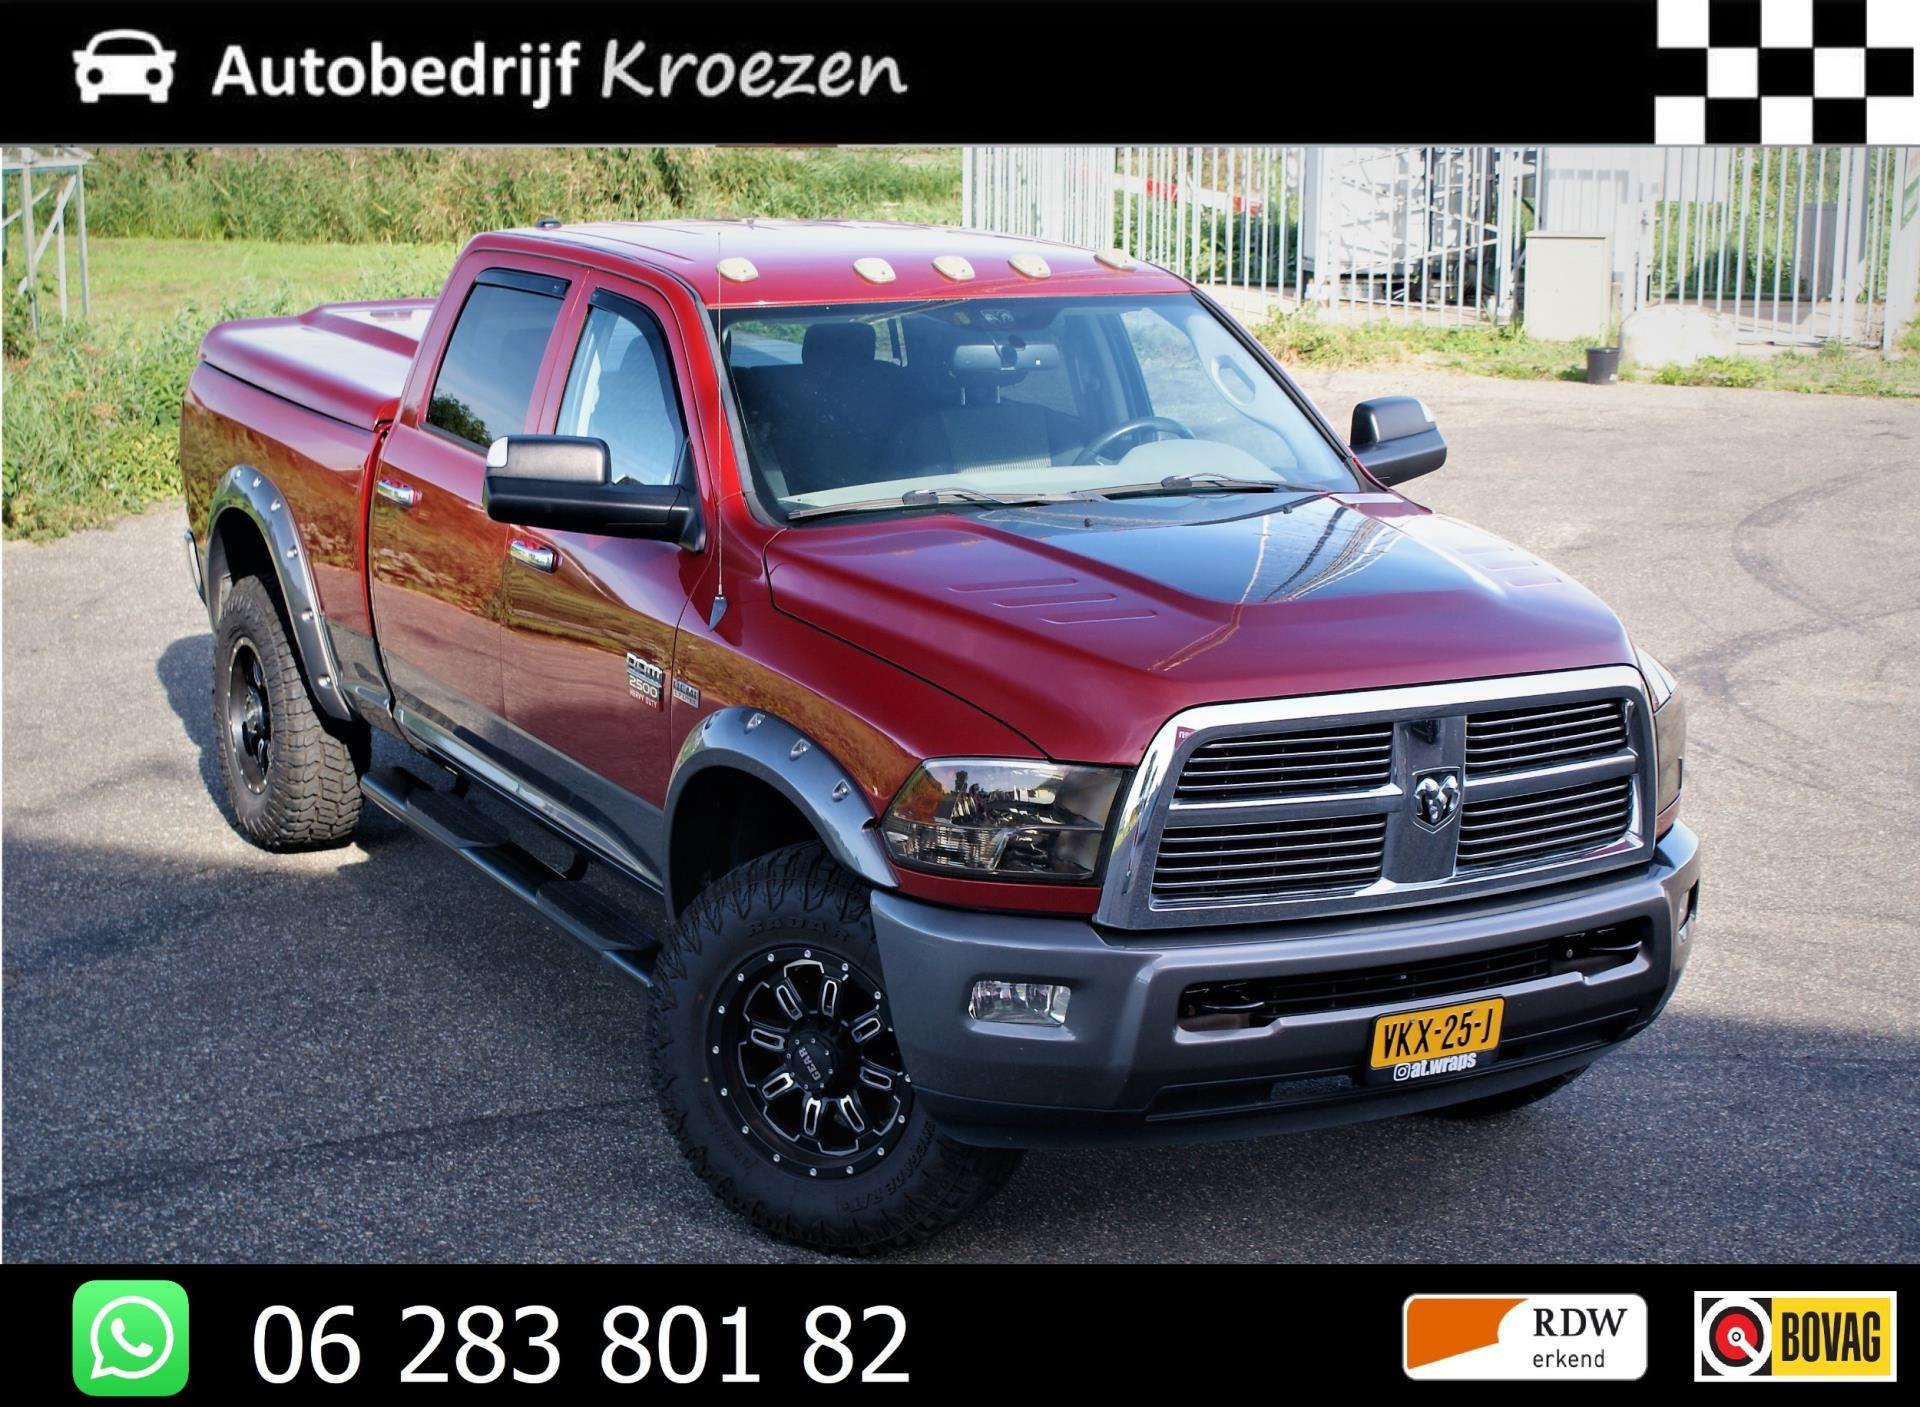 Dodge DODGE RAM 2500 occasion - Autobedrijf Kroezen